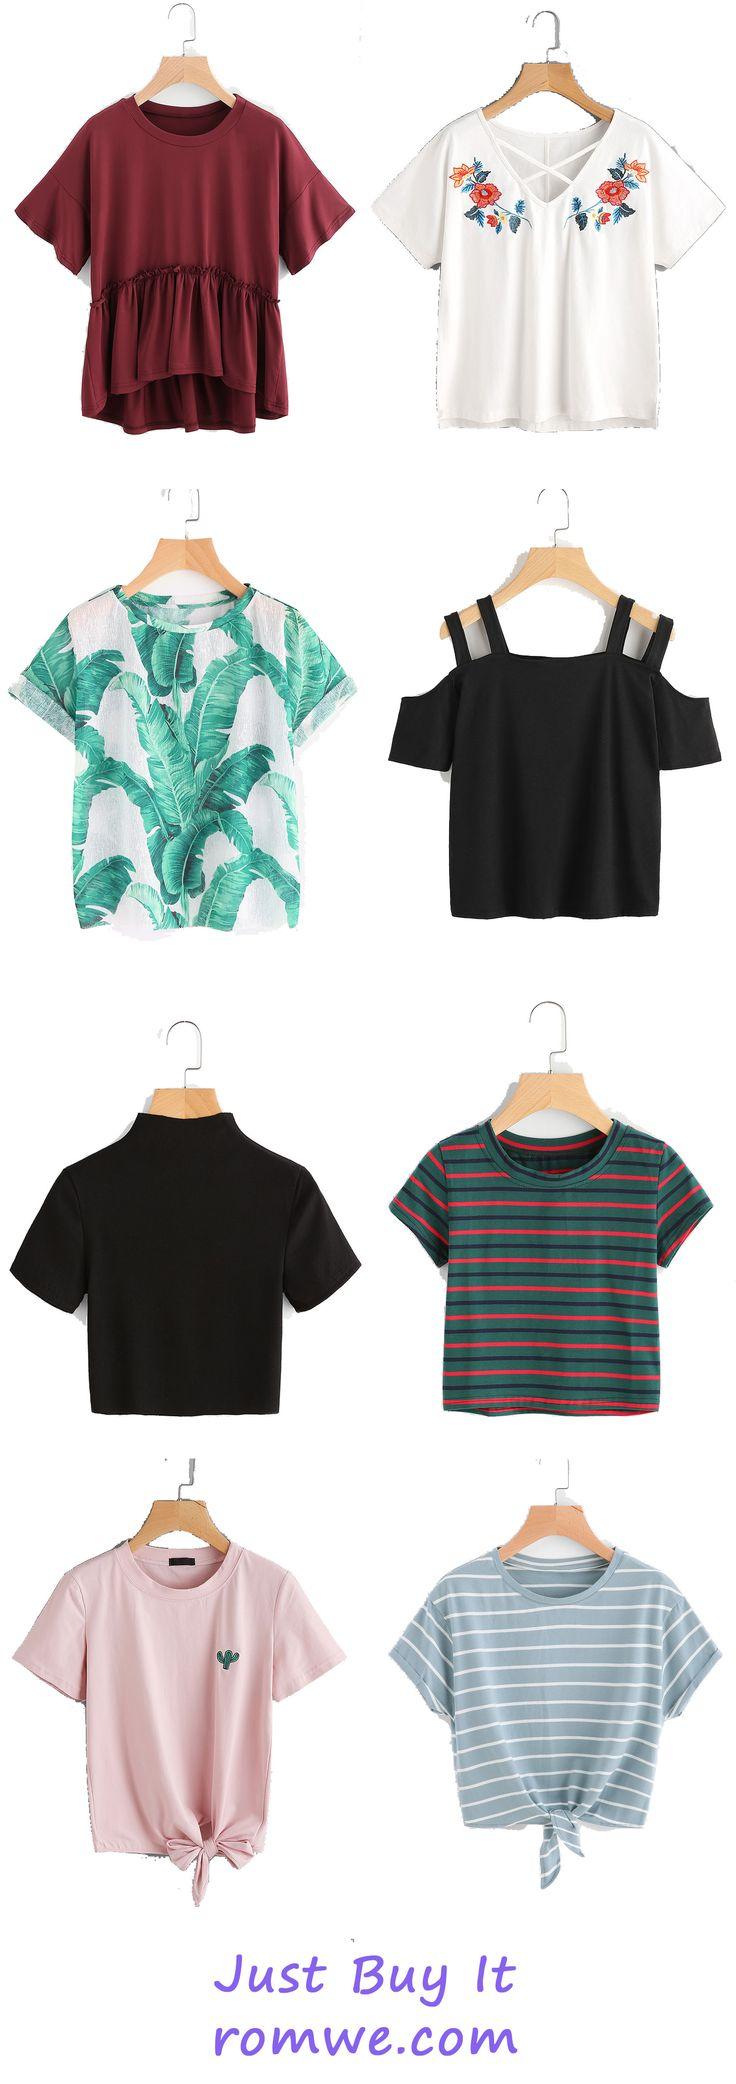 Chic & Cozy T shirts 2017 - romwe.com